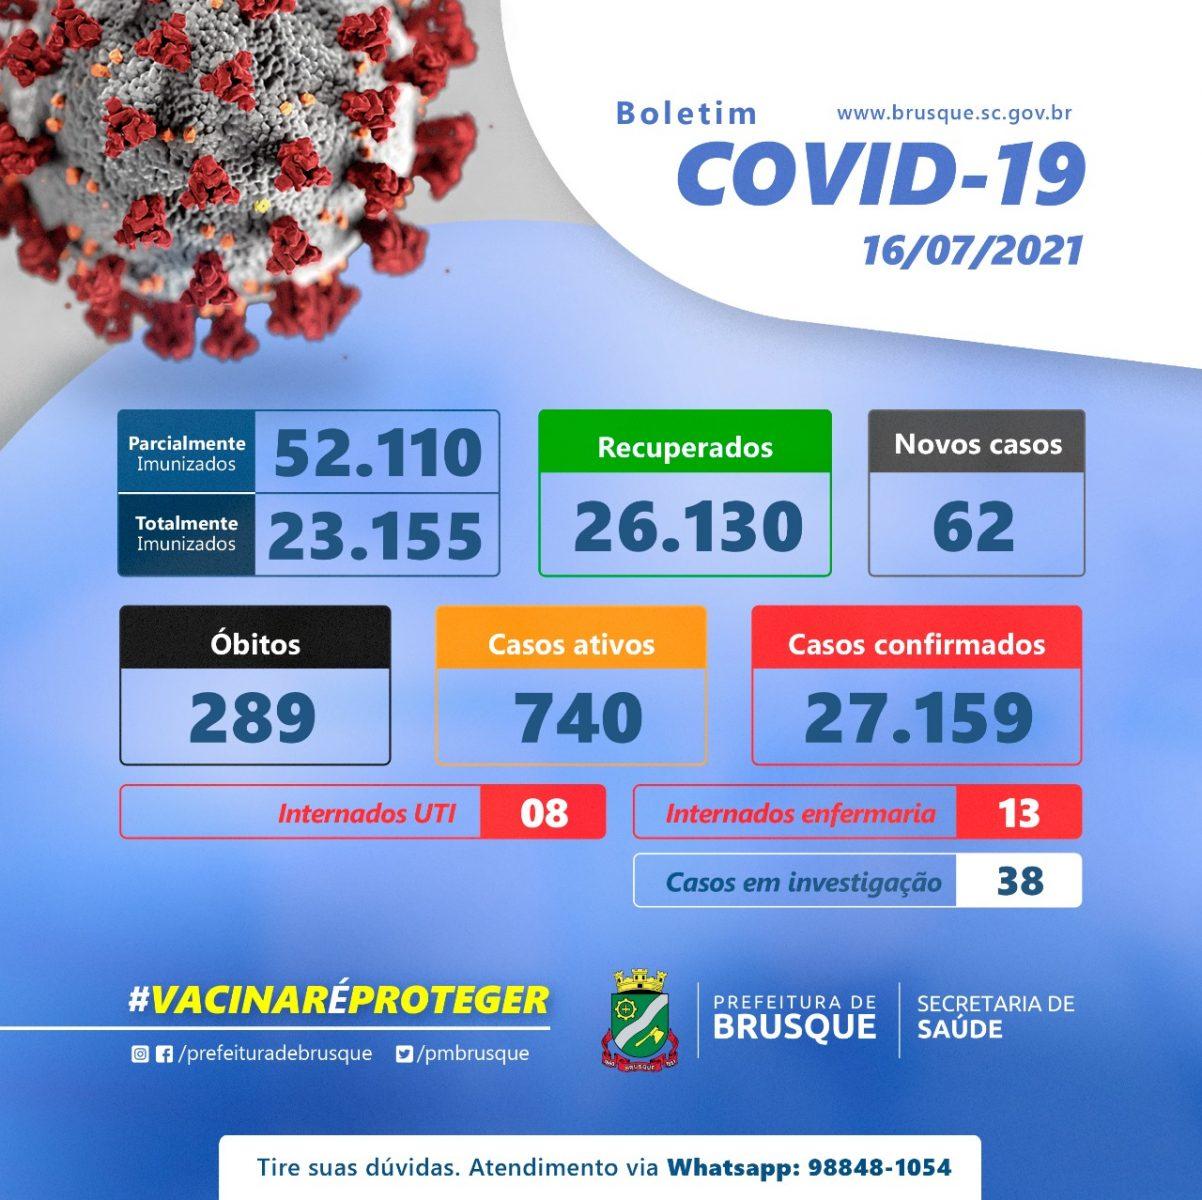 Covid-19: Confira o boletim epidemiológico desta sexta-feira (16)